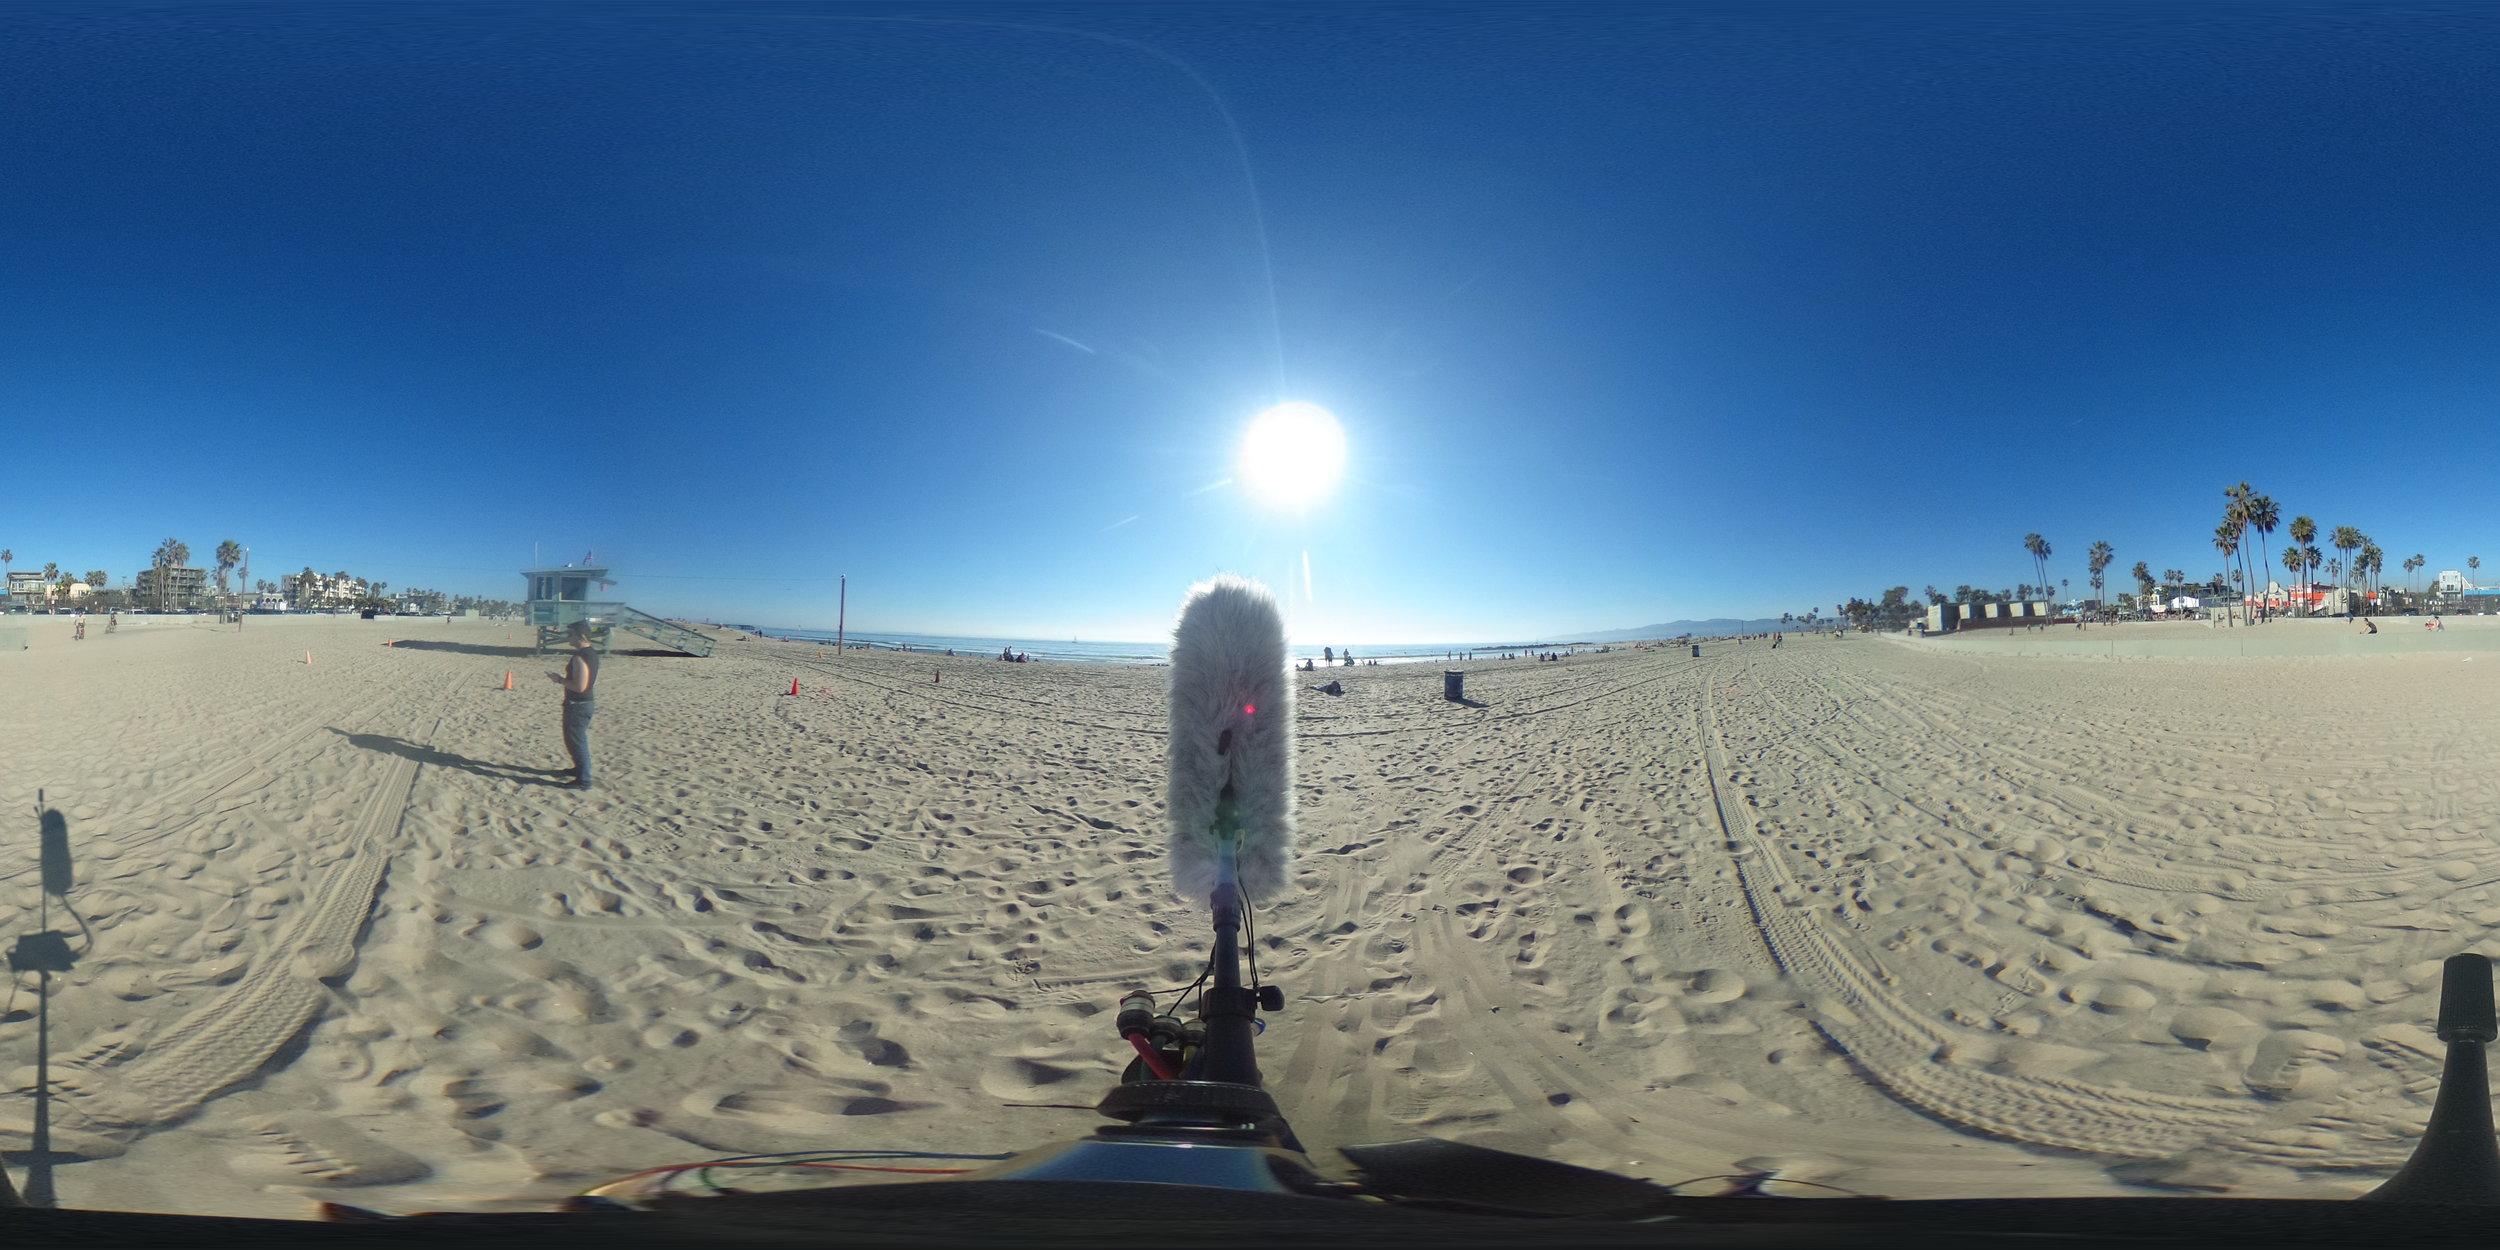 EXT_Day_Beach_ConstantDistantWaves_DistinctPlayfulVoices_BicycleBysWithBikeBell_HelicopterBys_DistantSeaGulls_JPEG.JPG